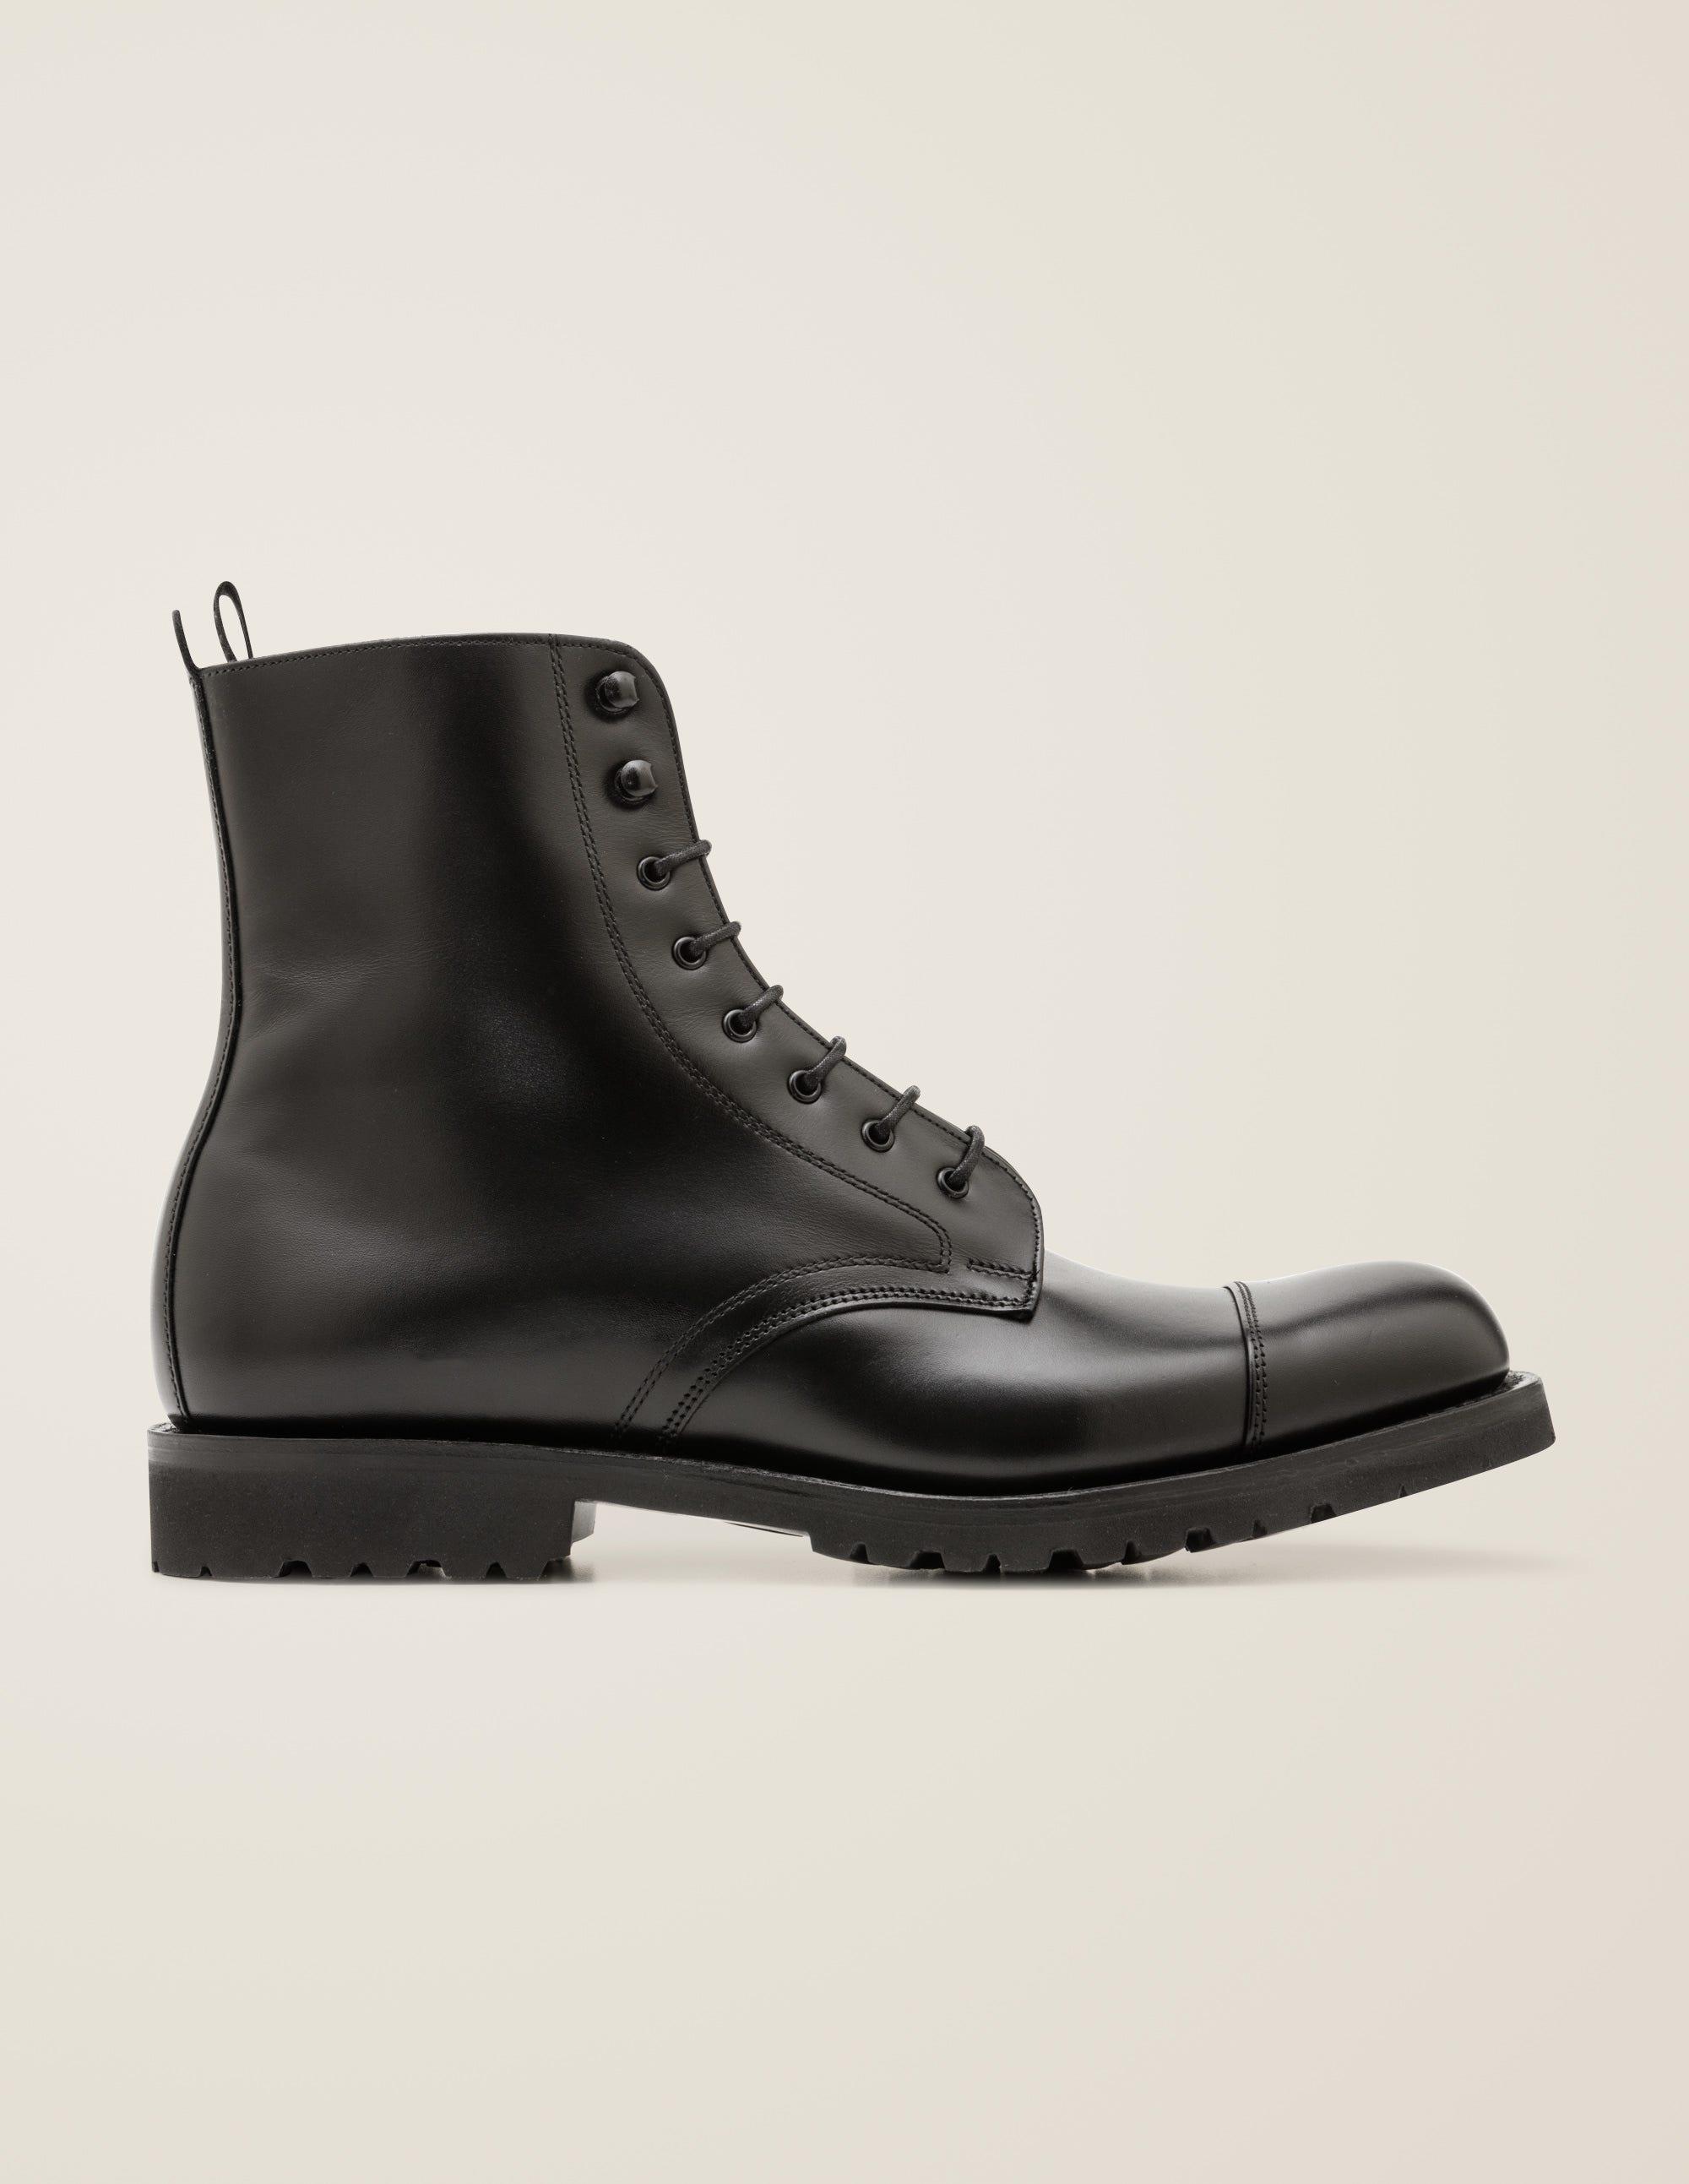 Cheaney Trafalgar Boot - Black Calf